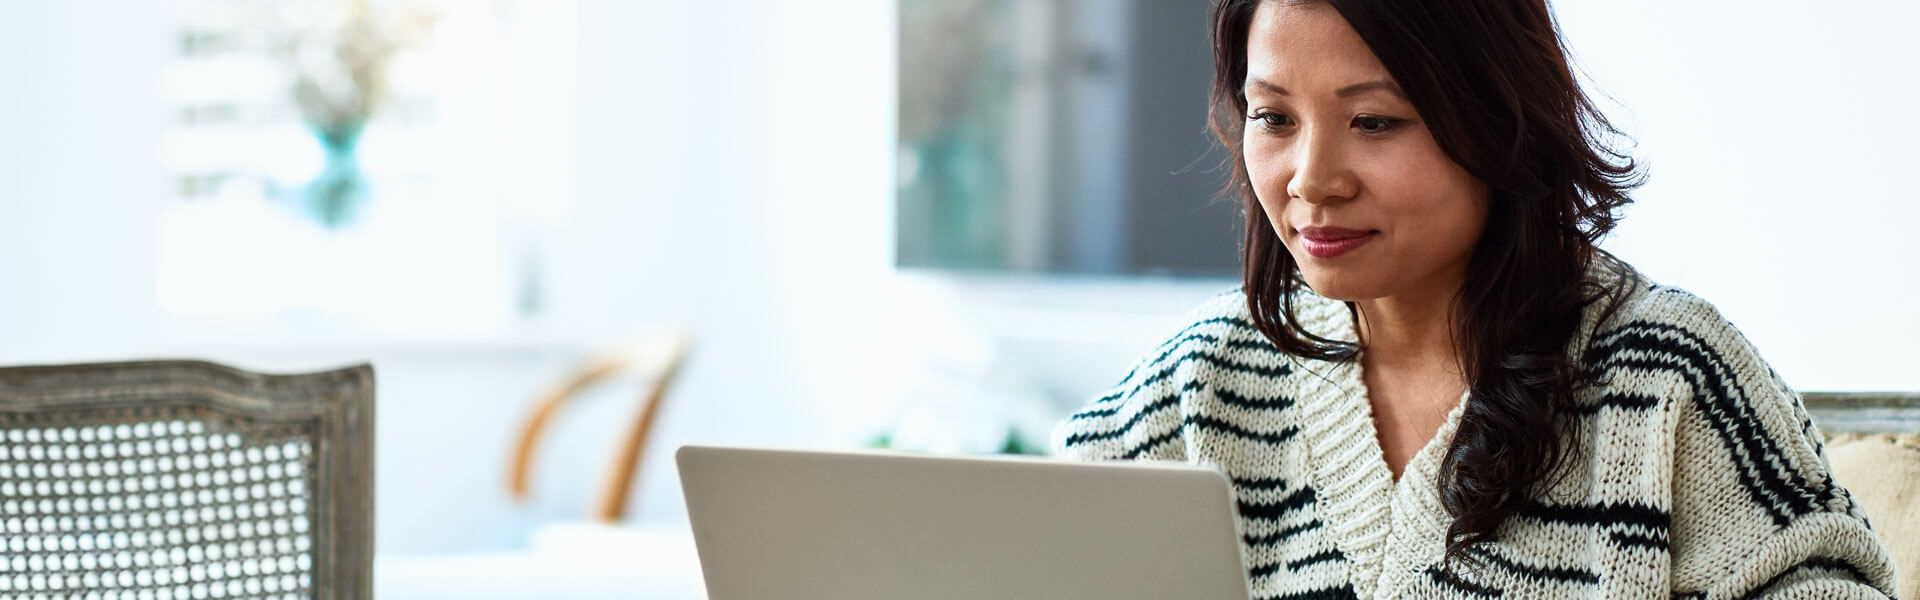 woman-looking-at-laptop